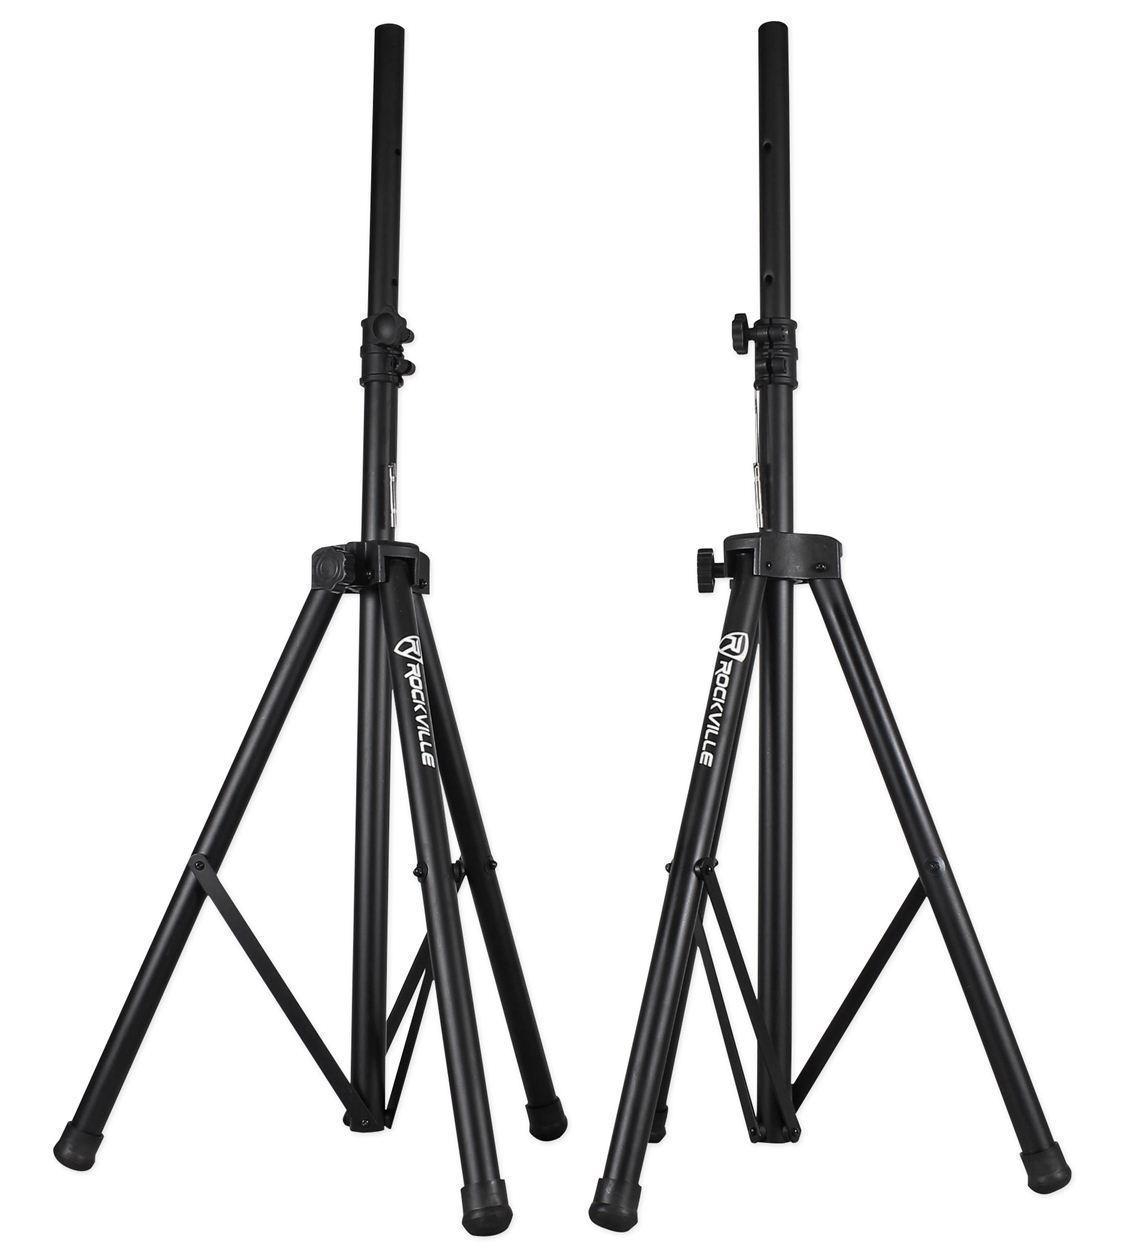 Pair of Rockville Adjustable Tripod Speaker/Light Stands+